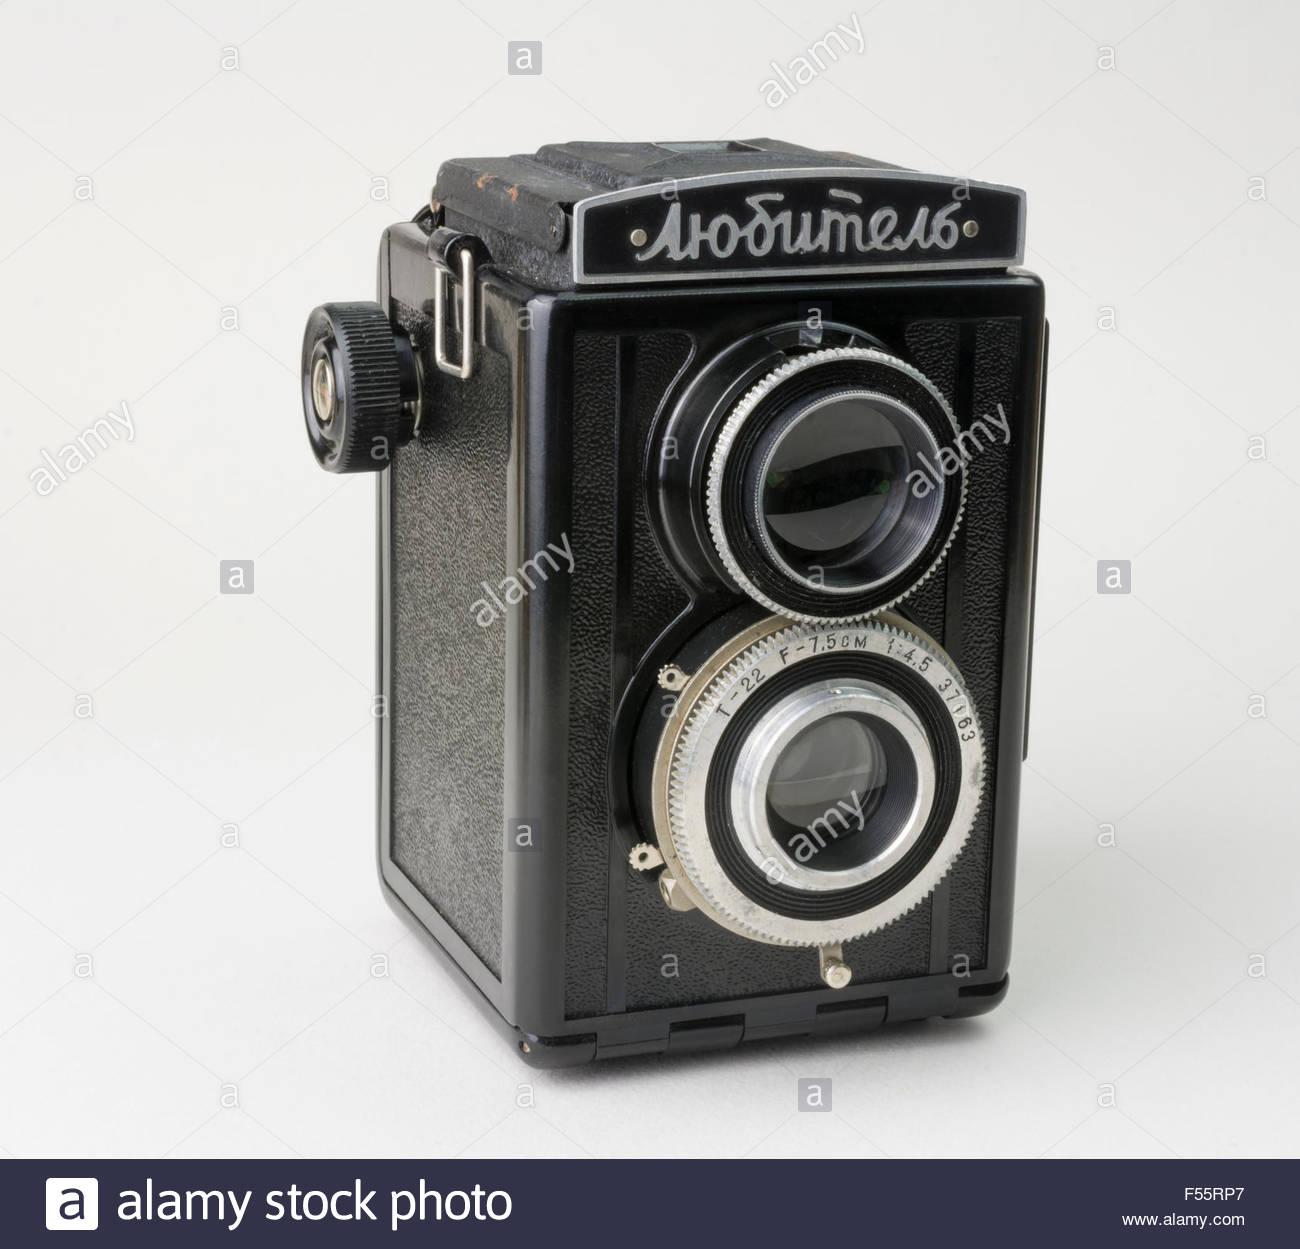 Lubitel Roll Film Camera from Soviet Russia - Stock Image